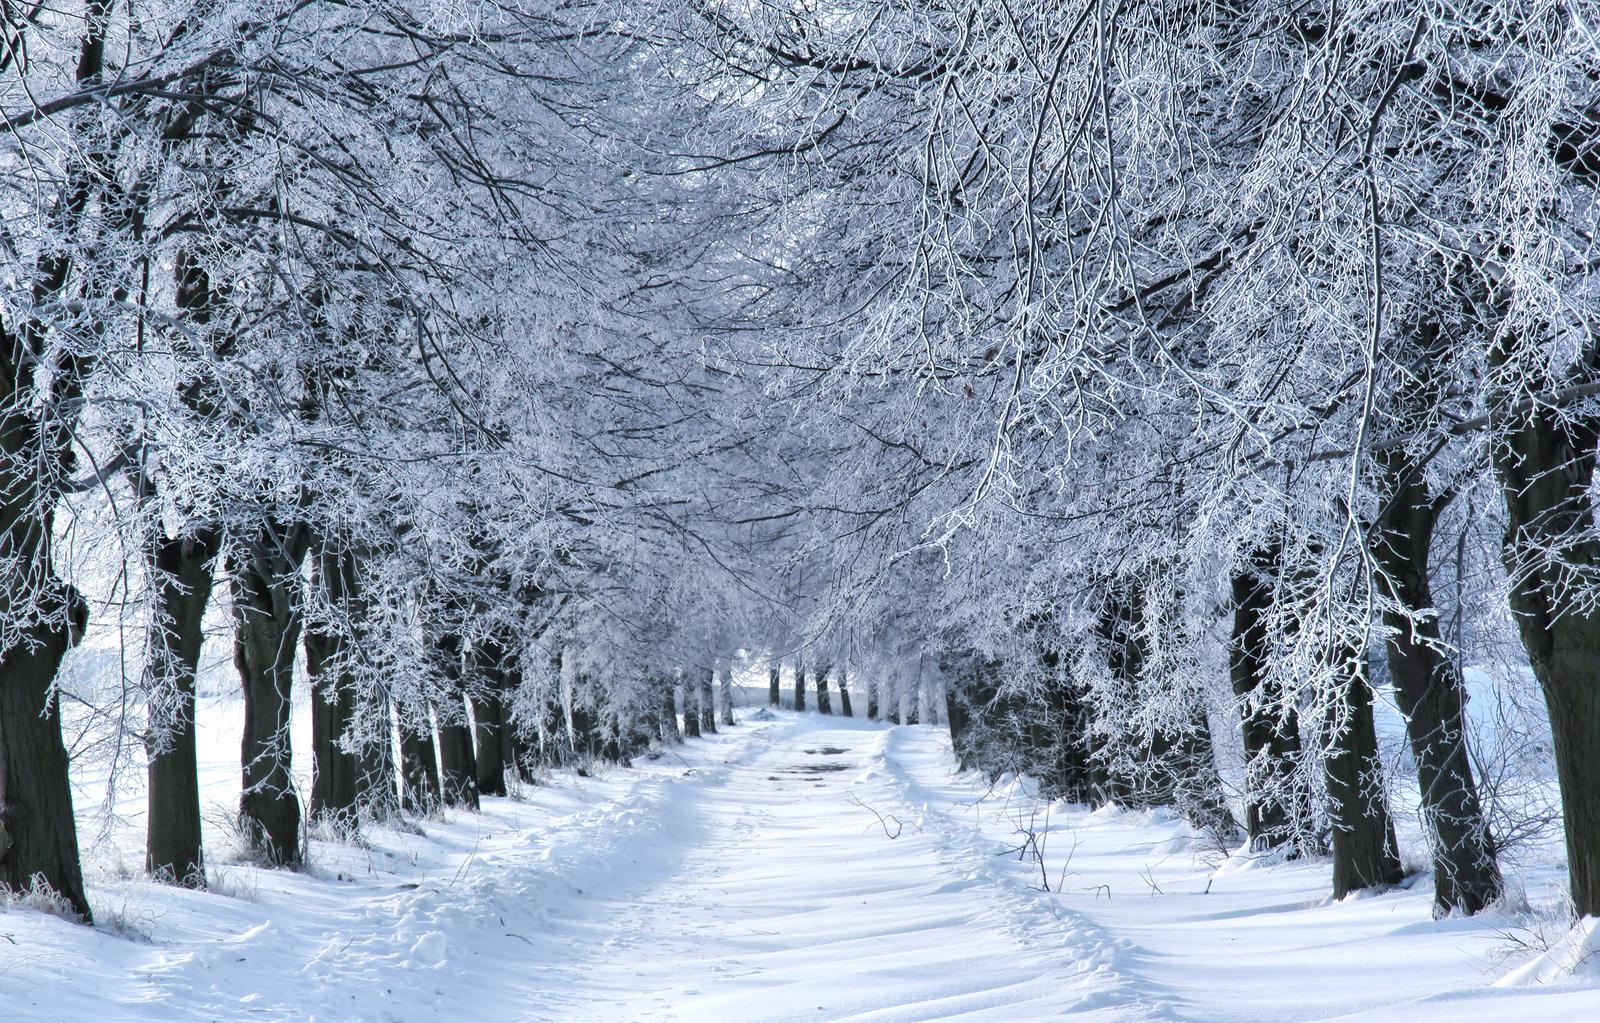 Winter Wonderland Package Visit Ct